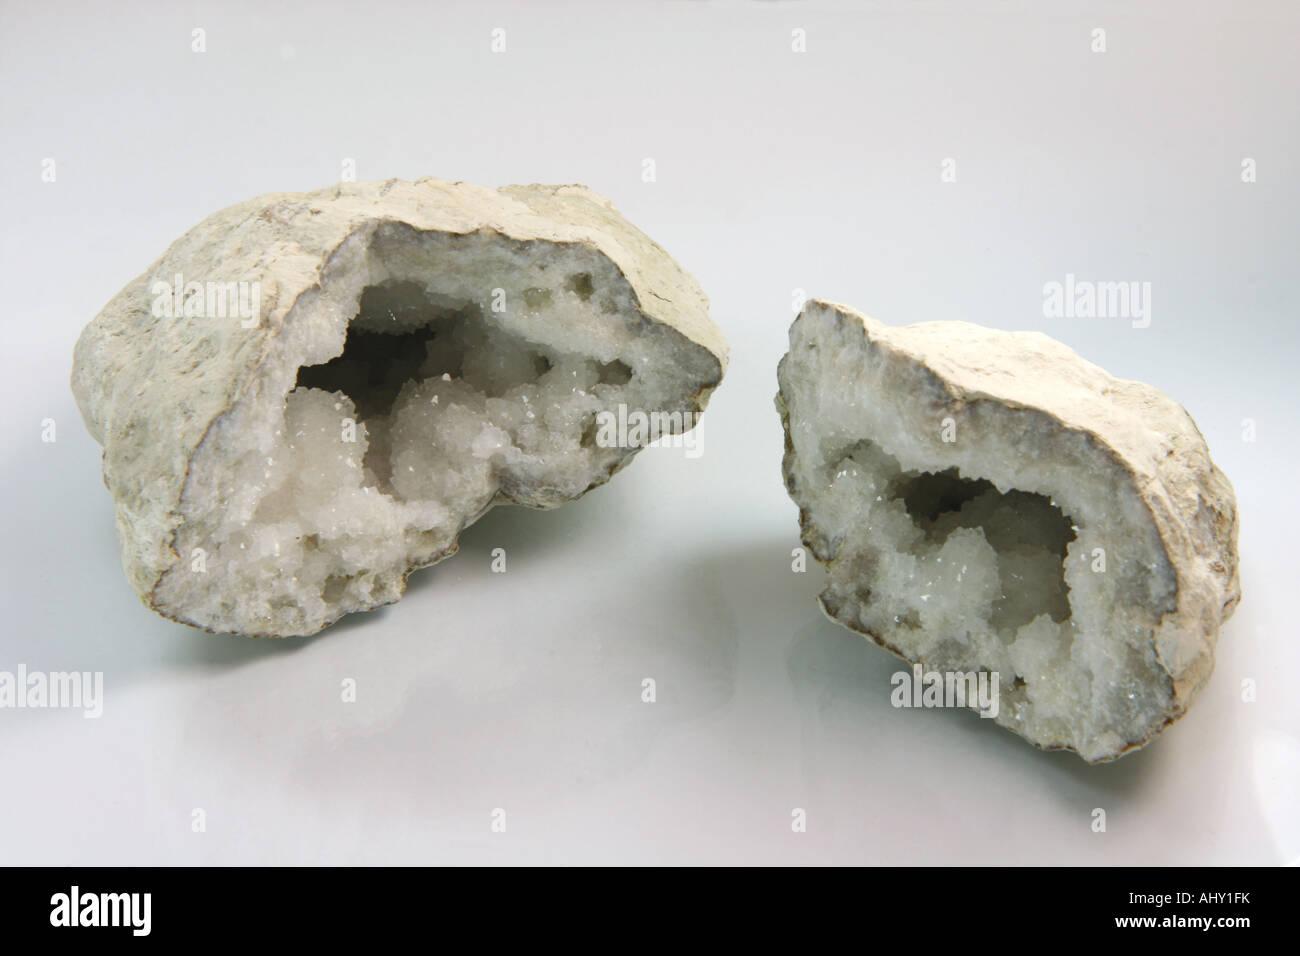 crystal stone from sahara desert - Stock Image